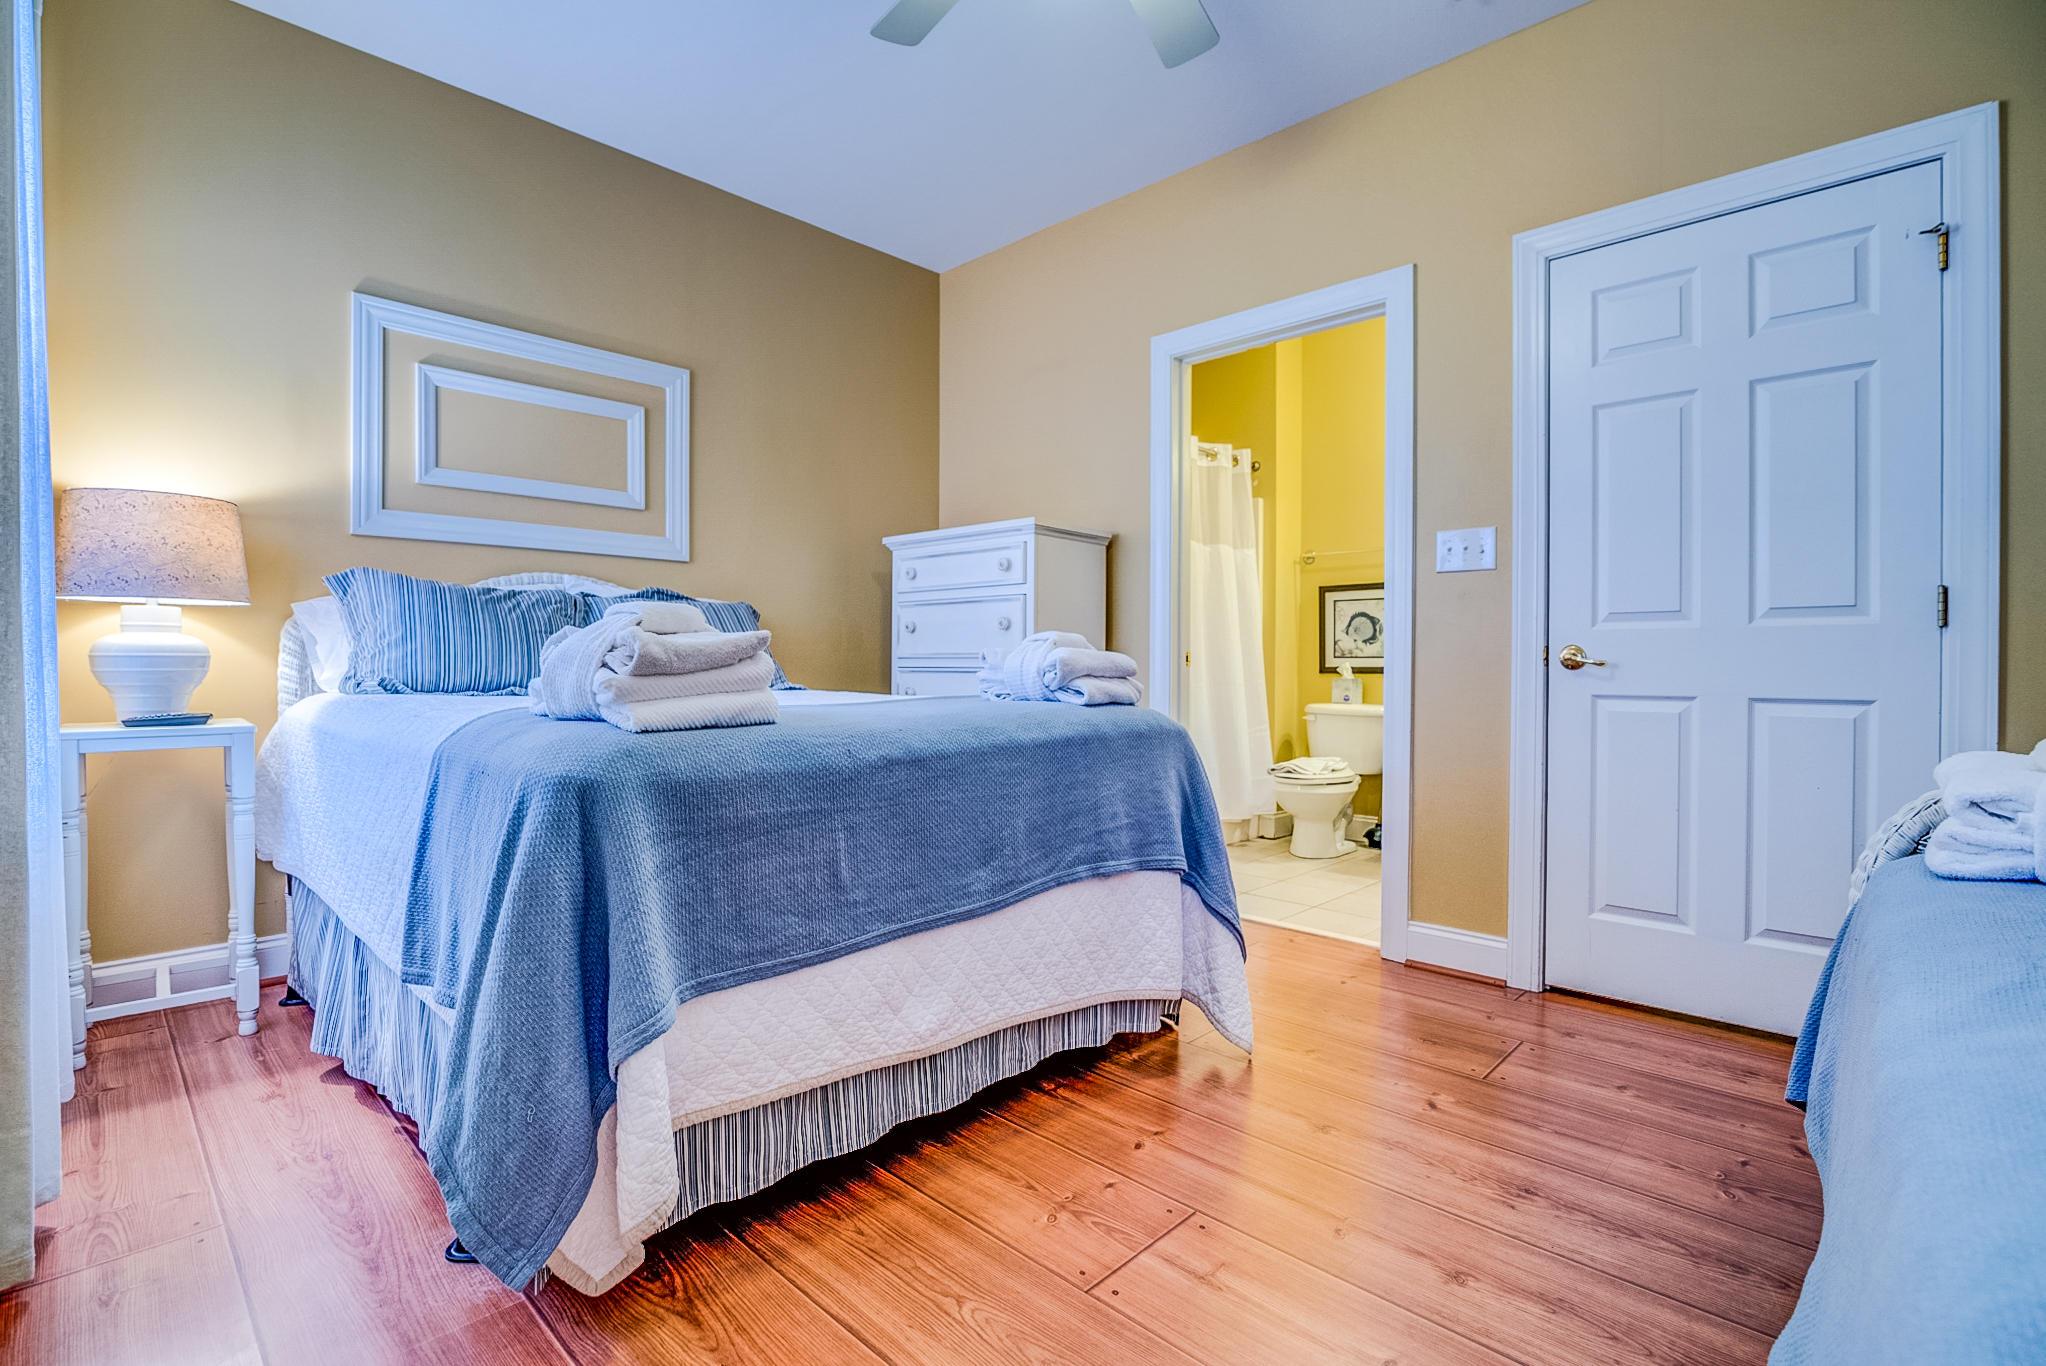 Ocean Pointe Villas Homes For Sale - 214 Arctic, Folly Beach, SC - 6